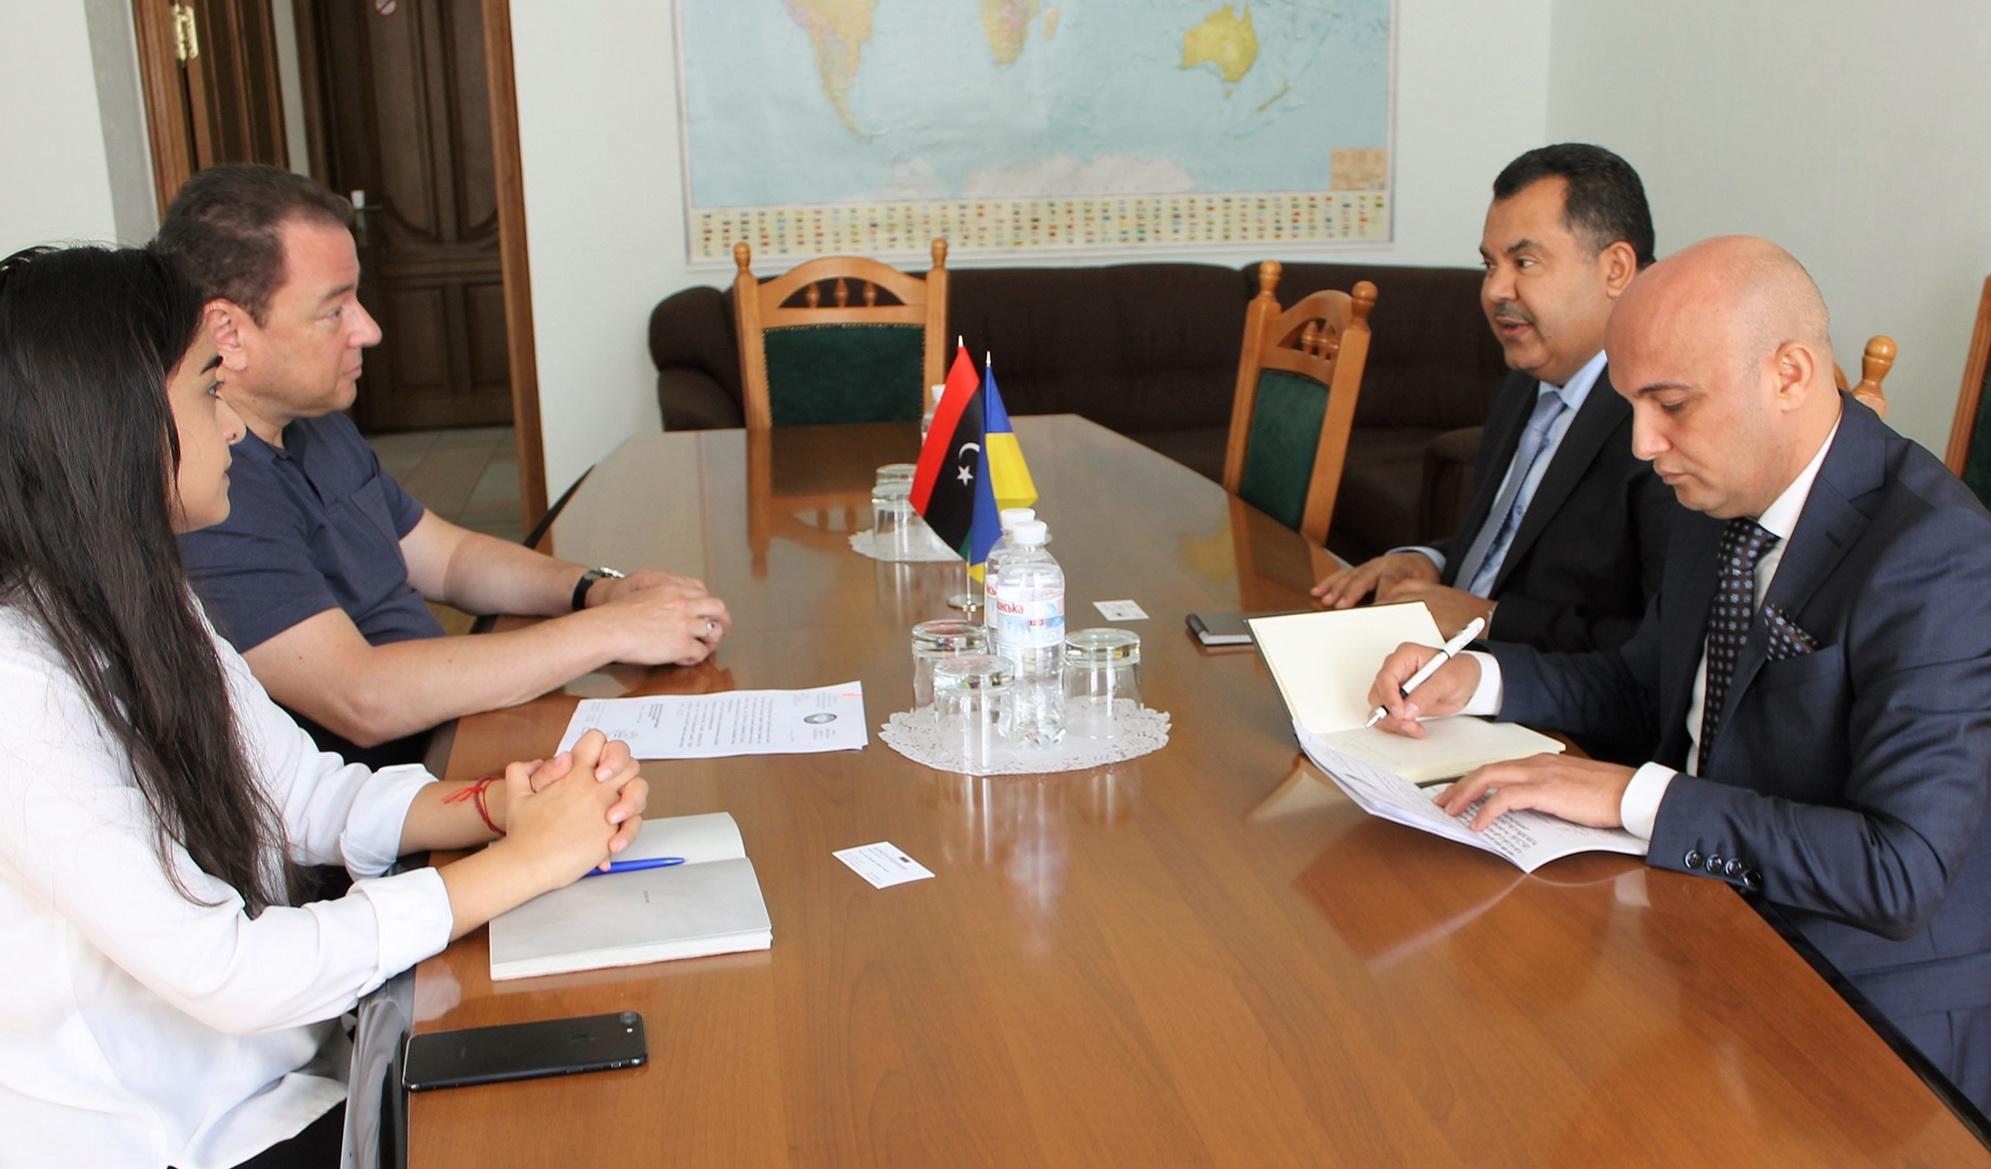 hennadii udovenko diplomatic academy of ukraine at the